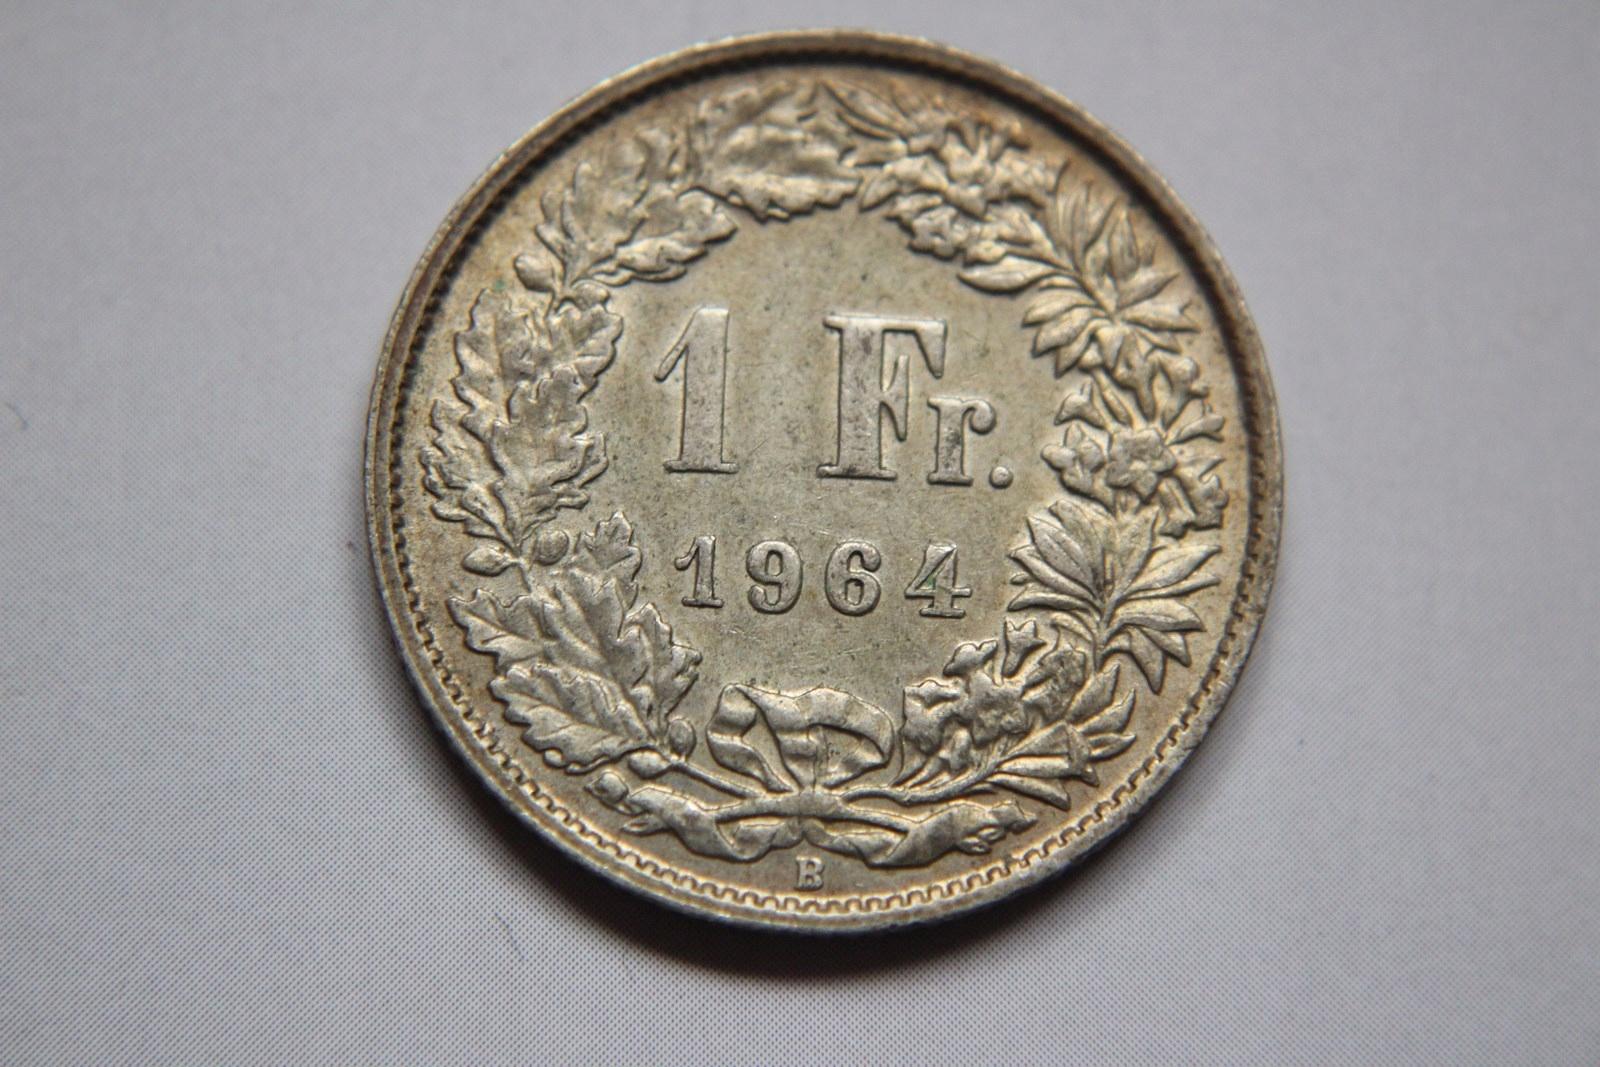 1 FRANK 1964 SZWAJCARIA SREBRO - CC851